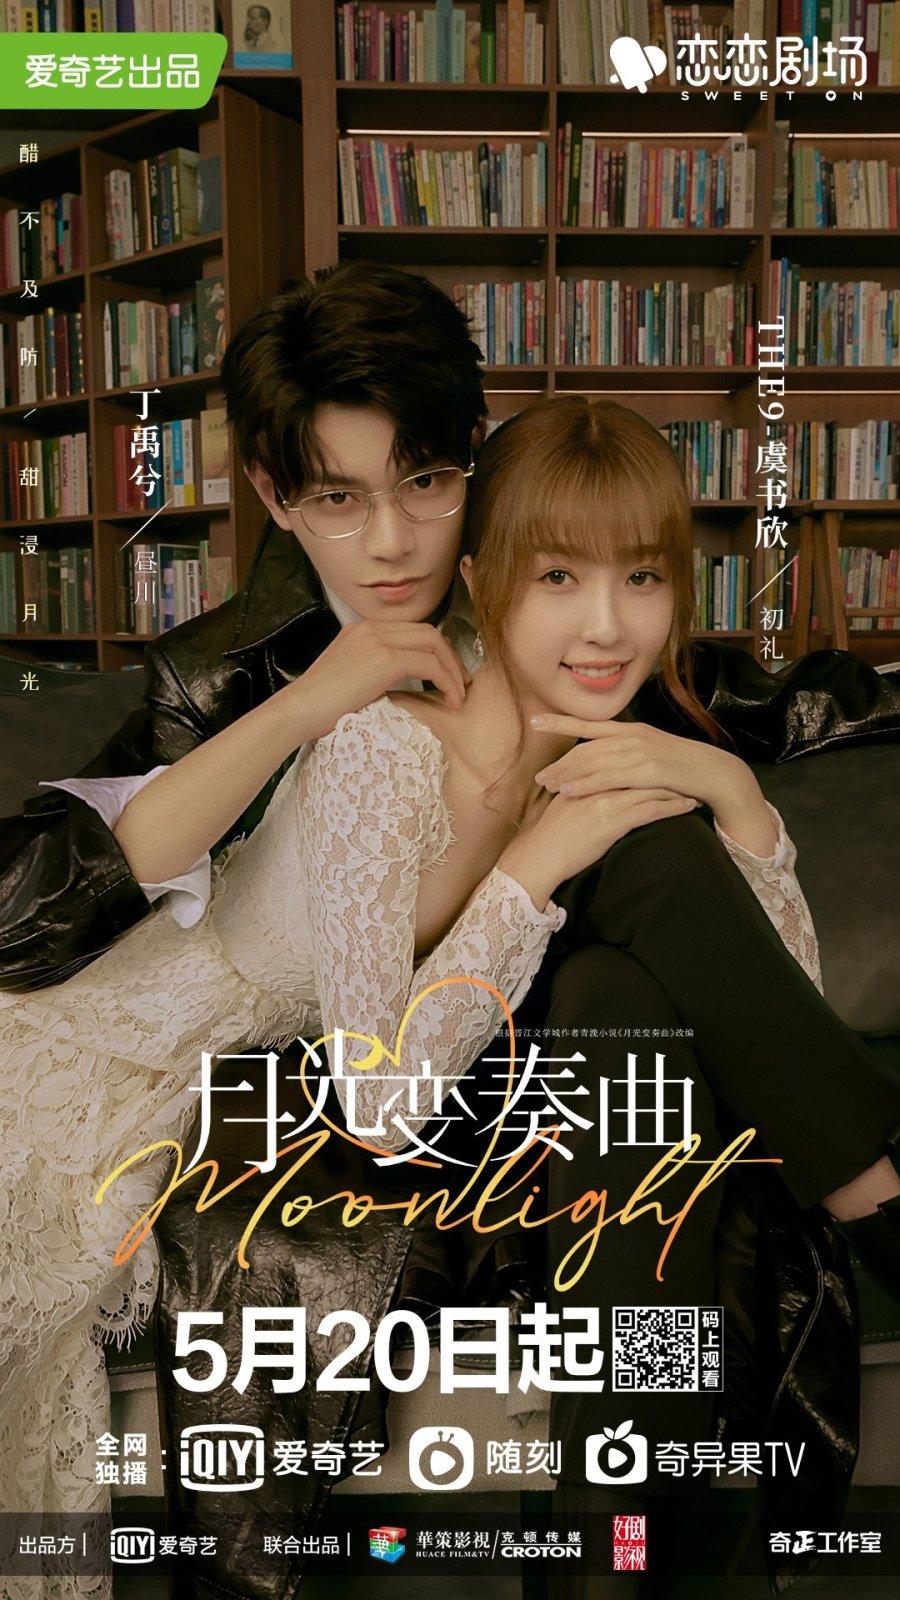 Moonlight (2021) / 月光变奏曲